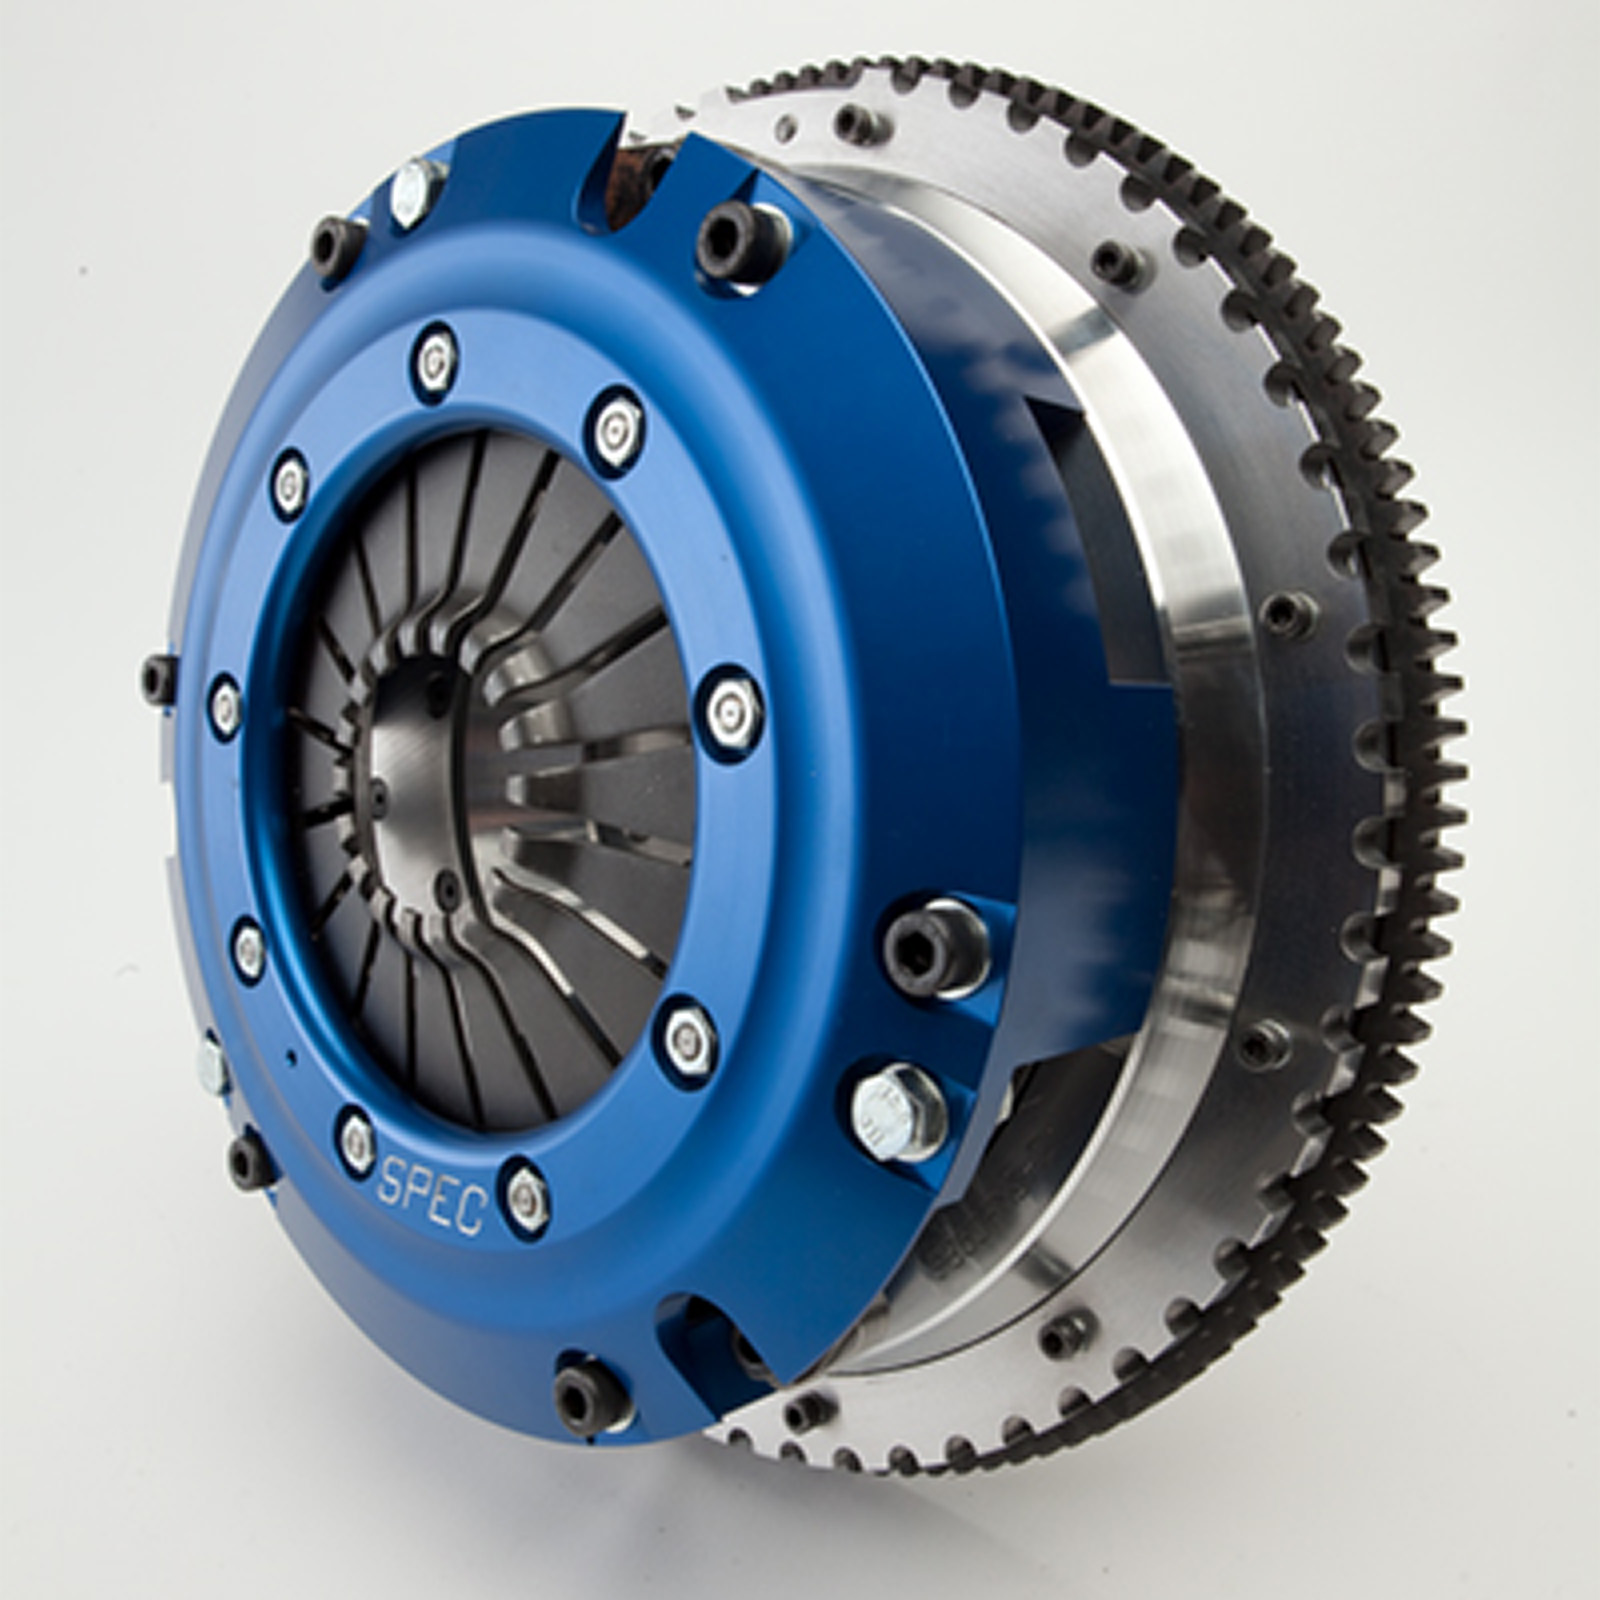 SPEC Clutches & Flywheels SB55 - PASMAG - since 1999 ...